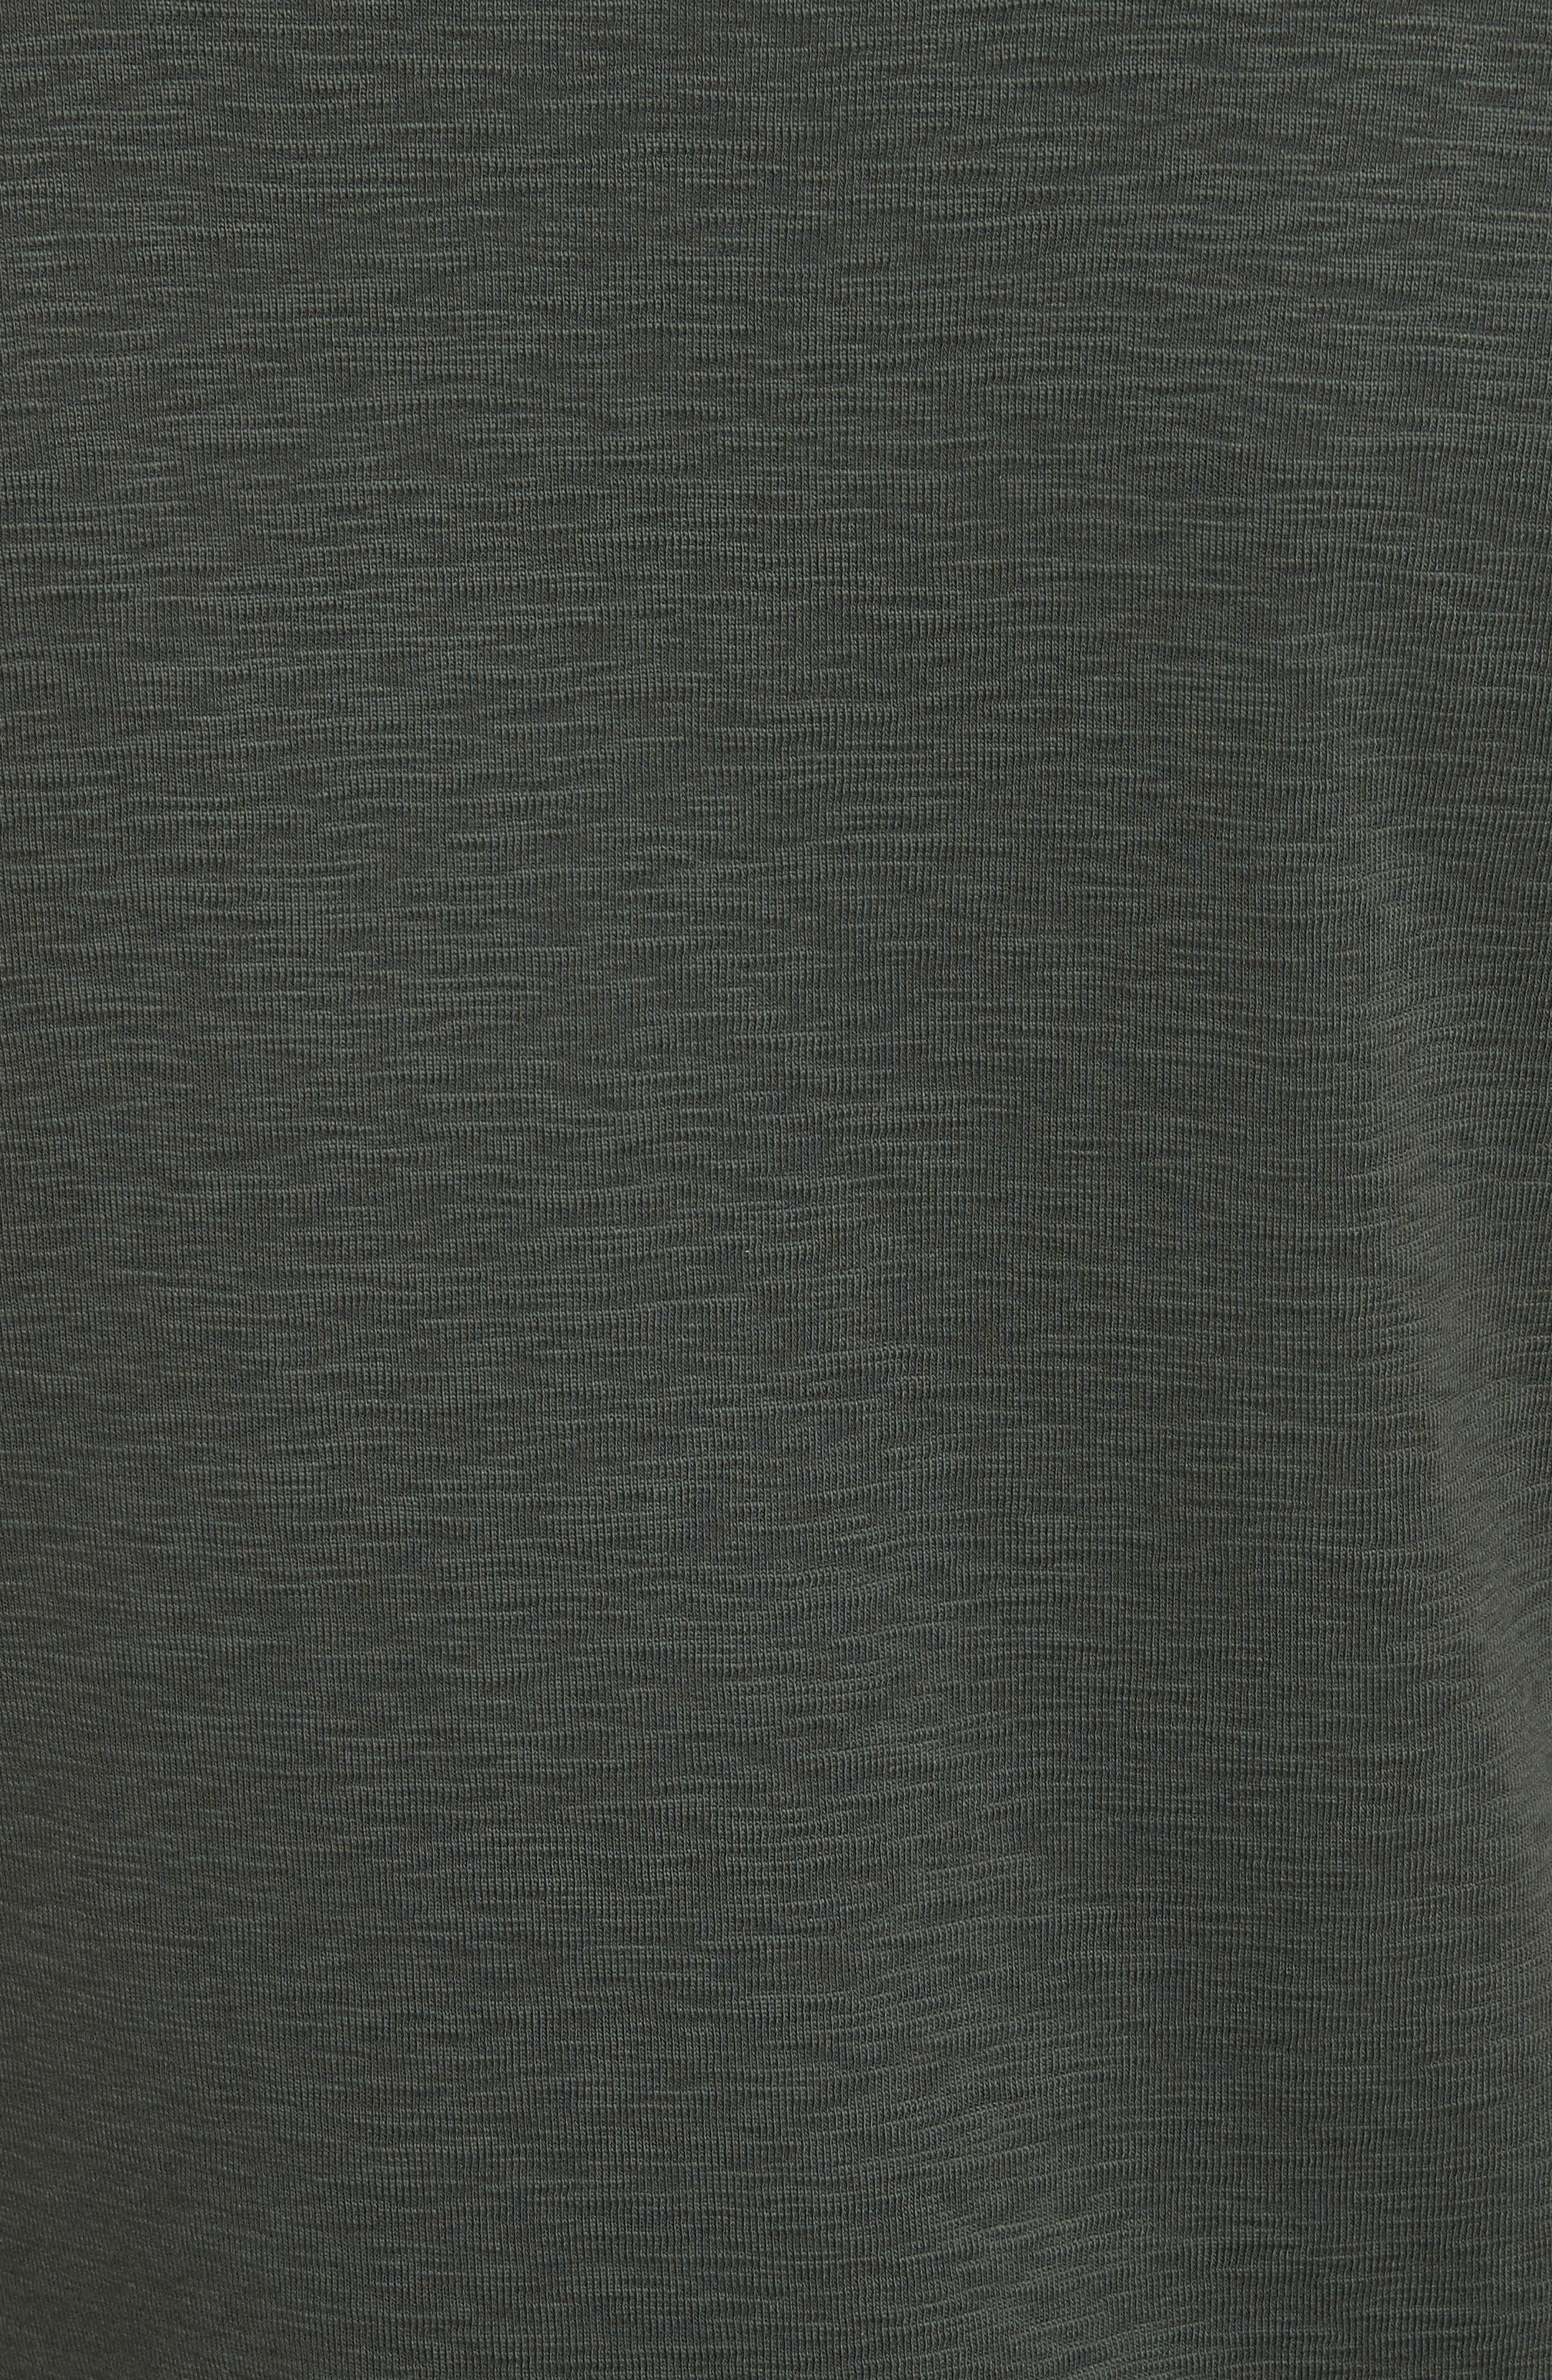 Alternate Image 5  - wings + horns Ribbed Slub Cotton T-Shirt